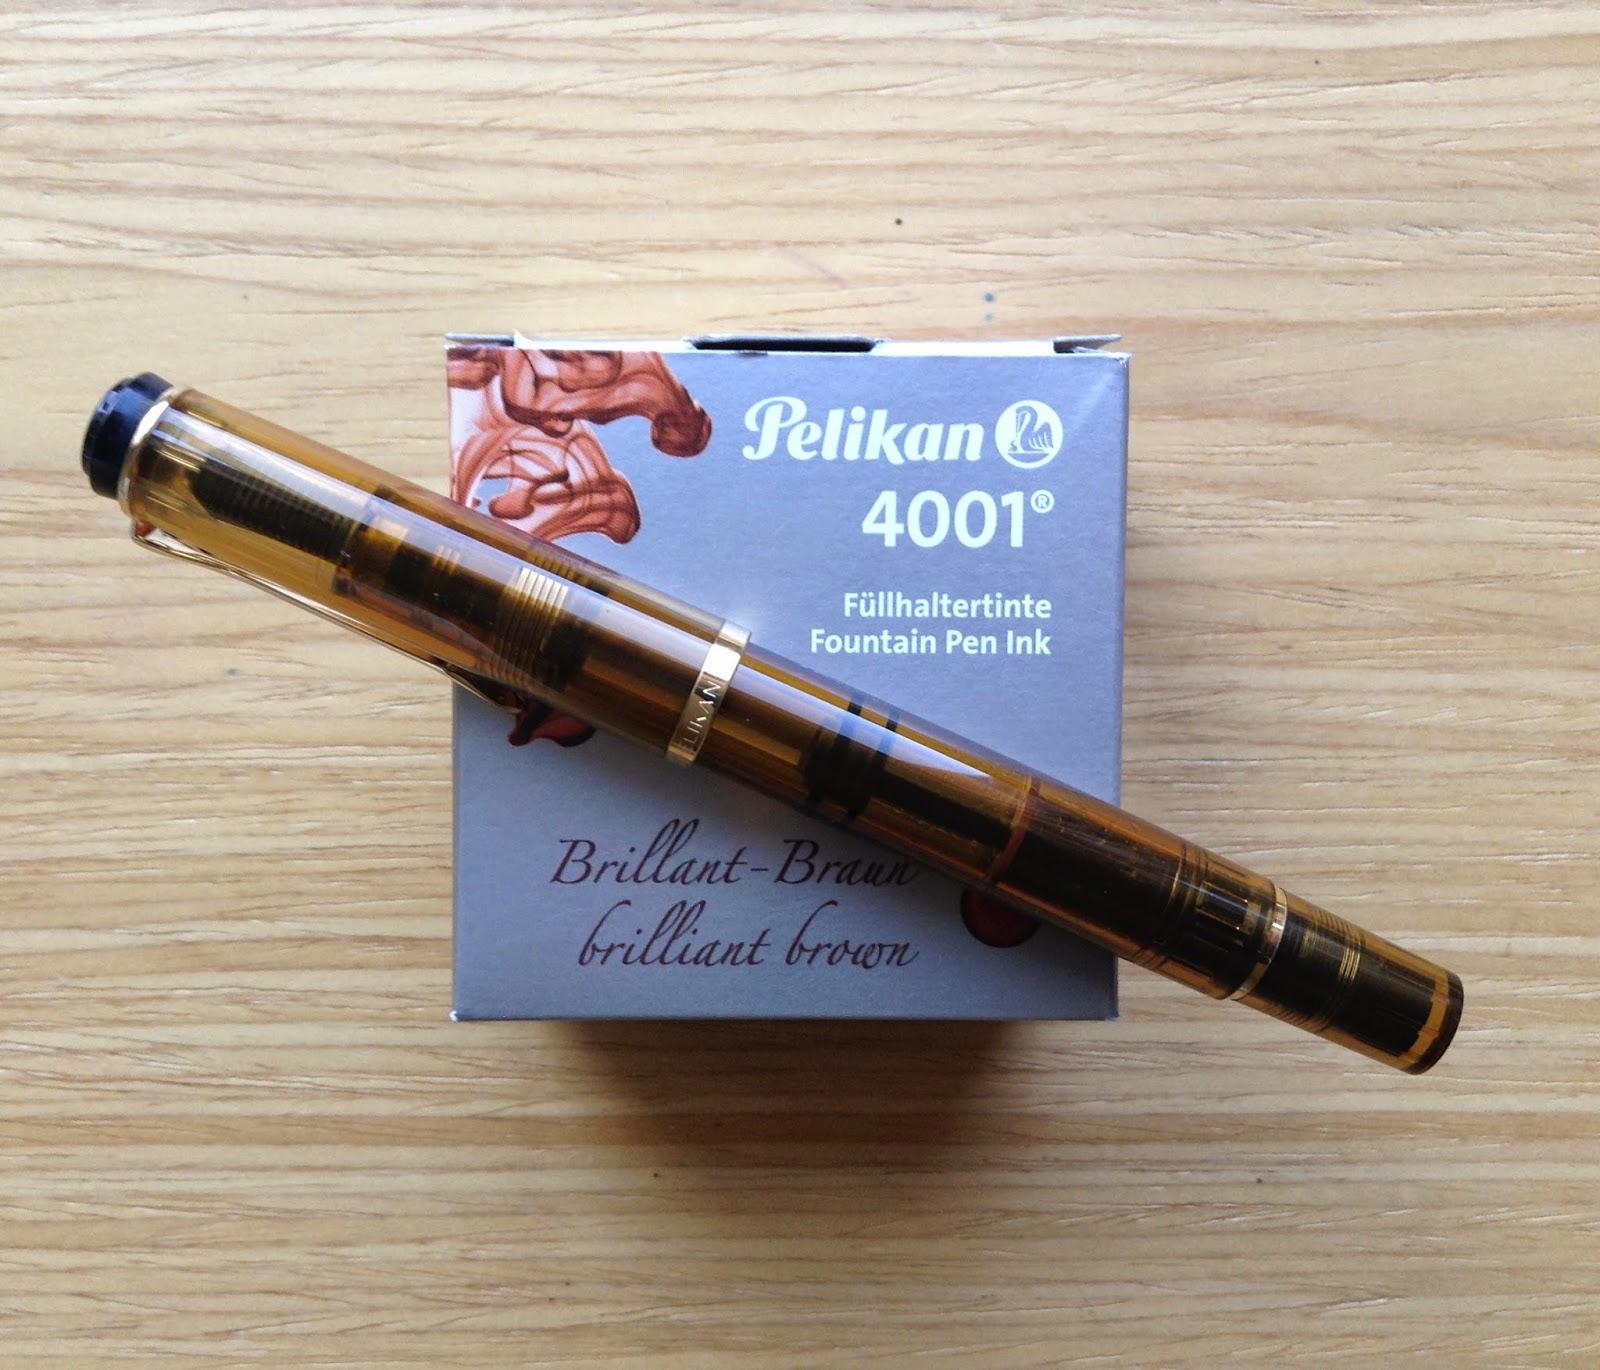 Dolma Kalem Murekkep Ve K Rtasiye Tavsiyeleri Pelikan Traditional M250 Amber Brown